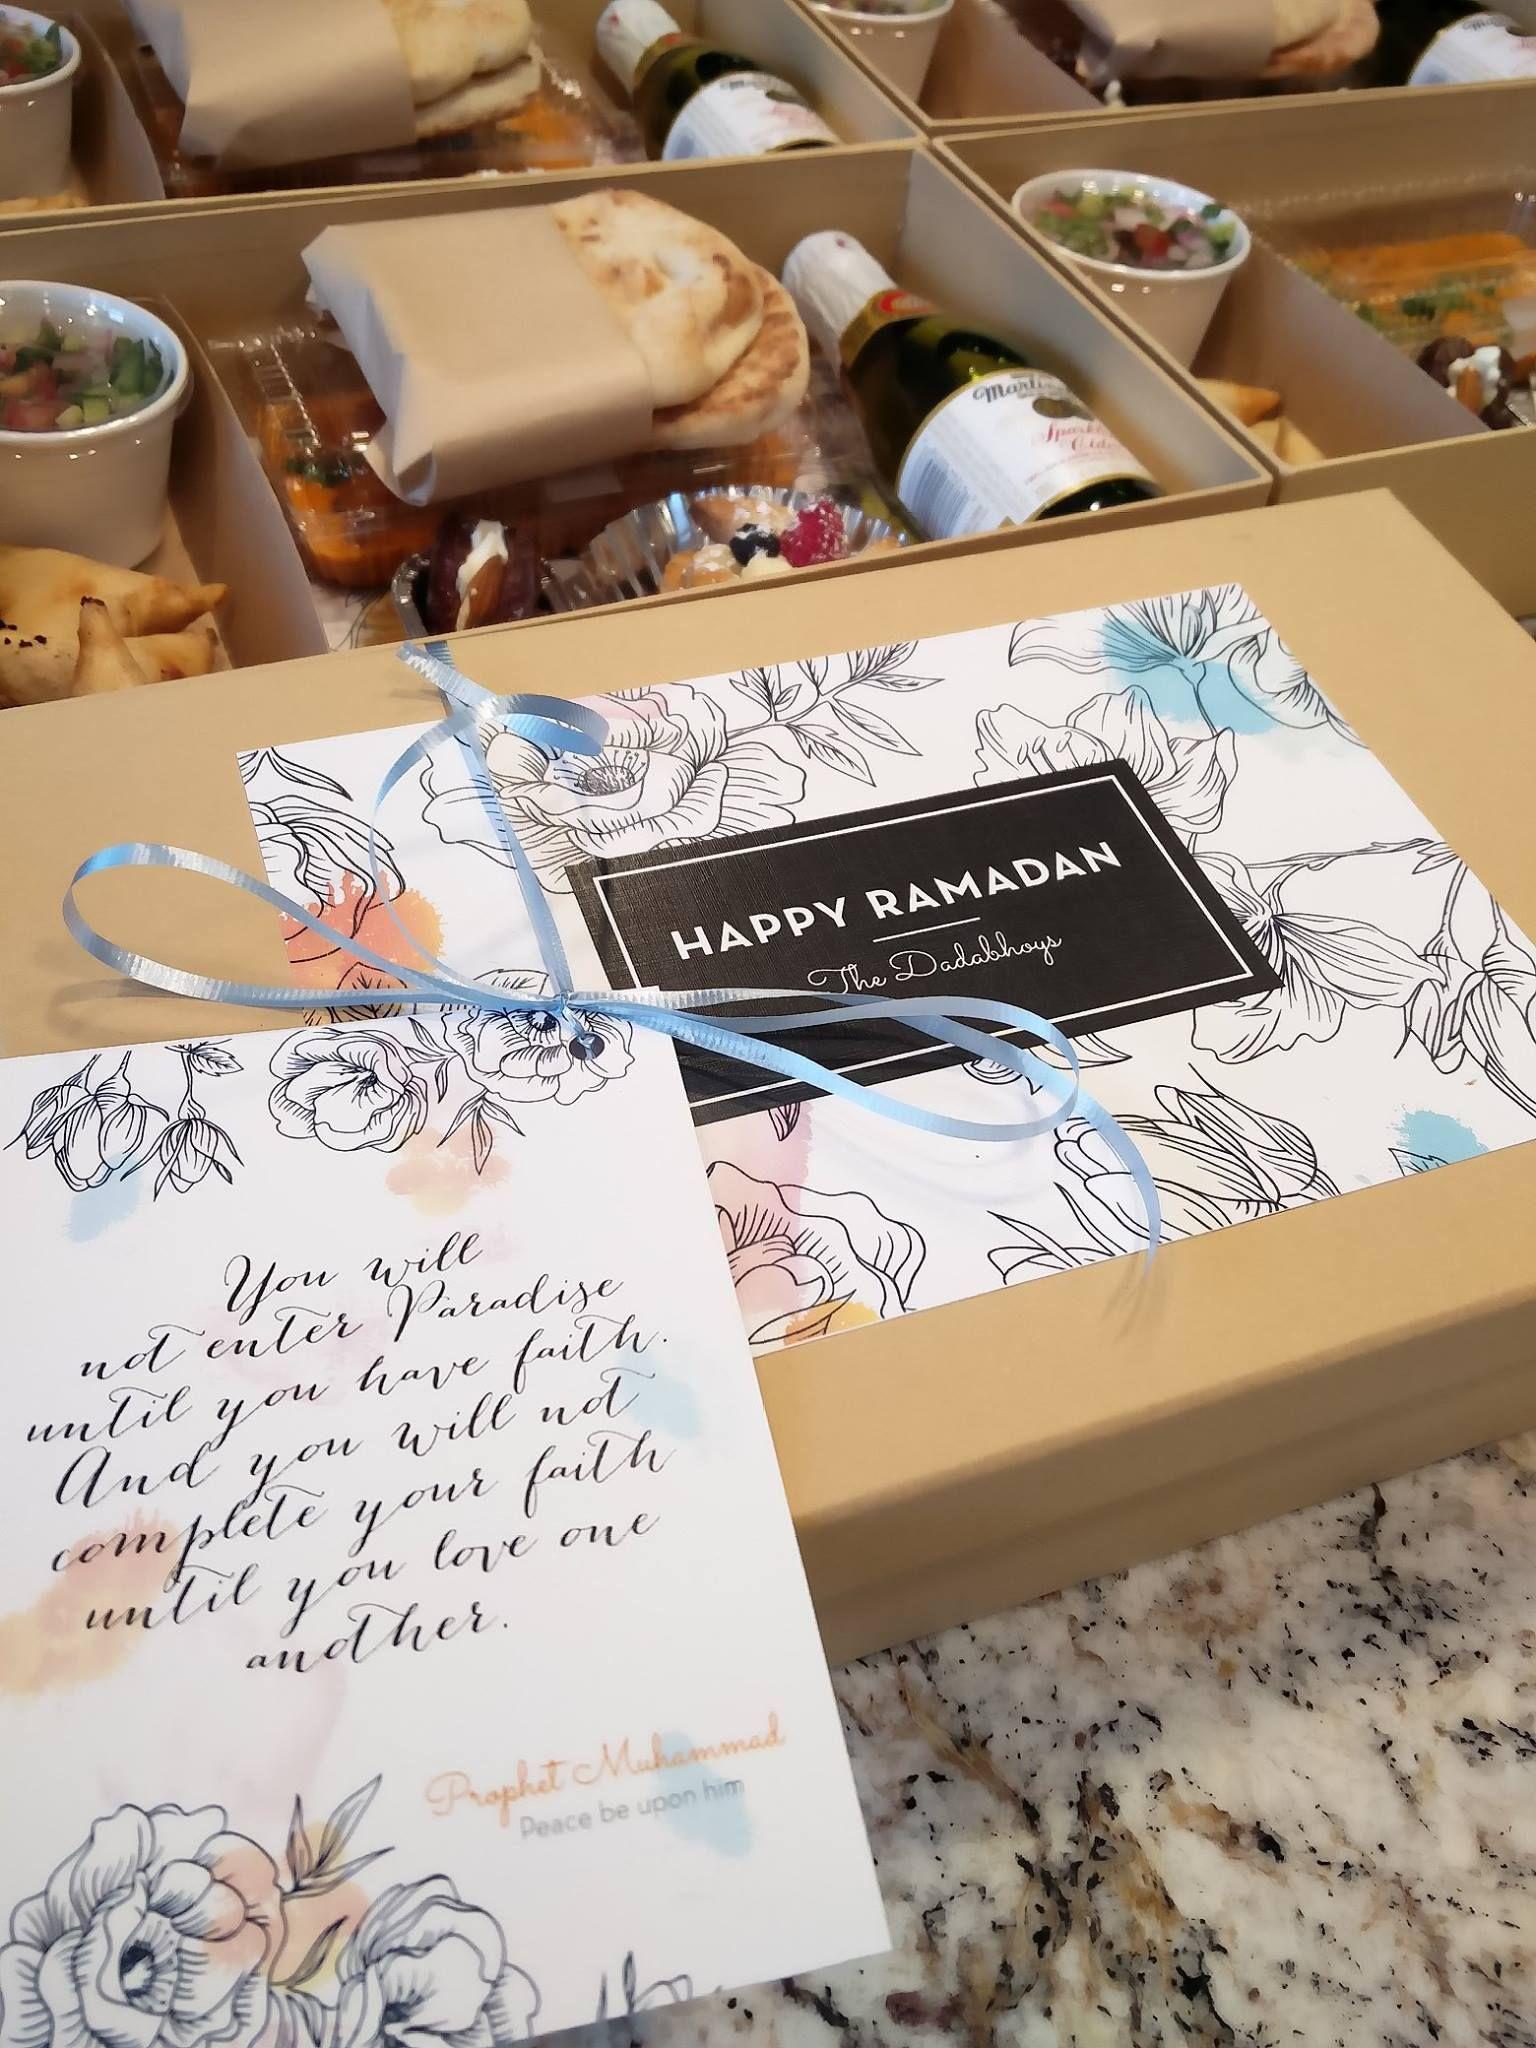 Ramadan Iftar Boxes For Neighbors With Images Ramadan Gifts